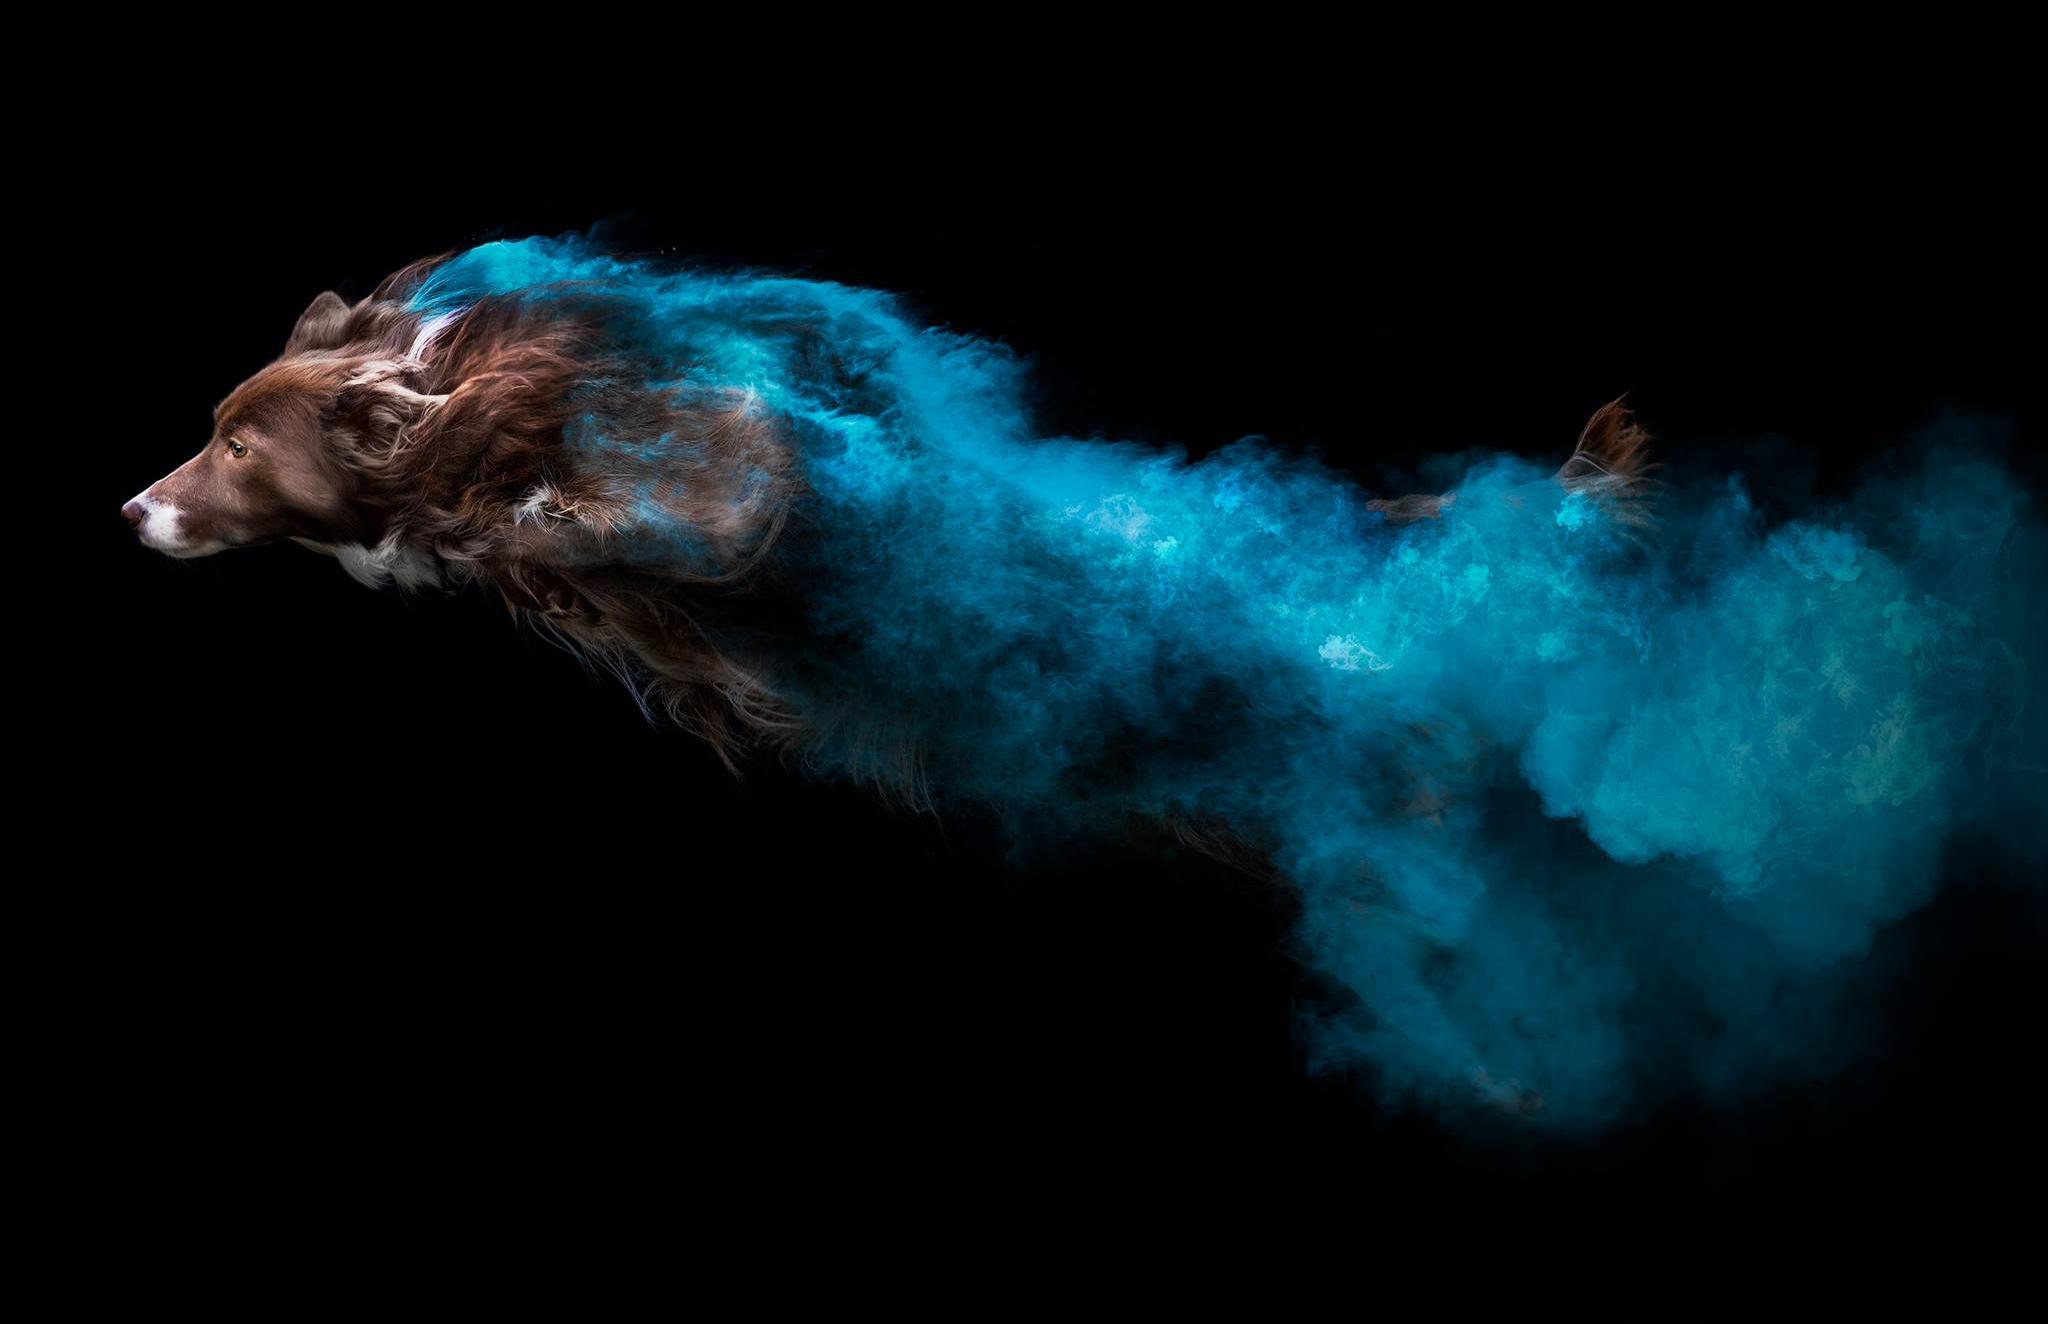 Toronto Dog Photographer Jess Bell Photography, artistic animal imagery, holi powder